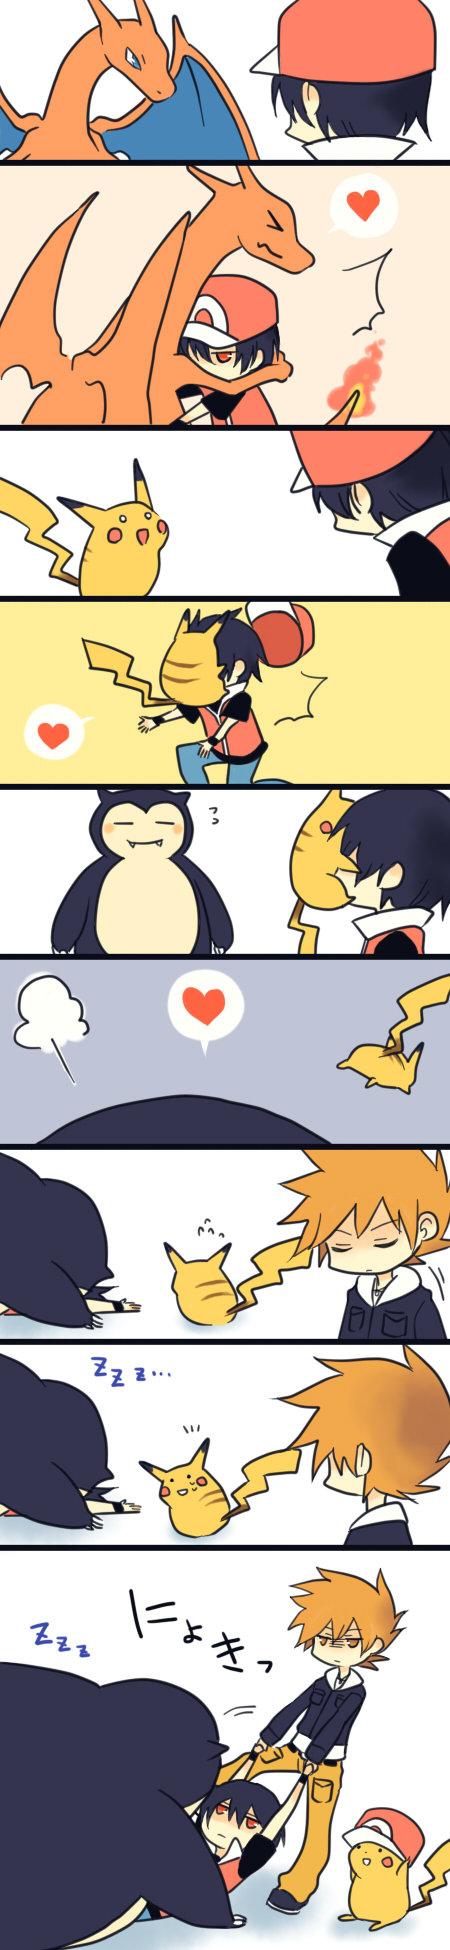 pokemon comic. :I.. So random yet so cute. car crashes ect